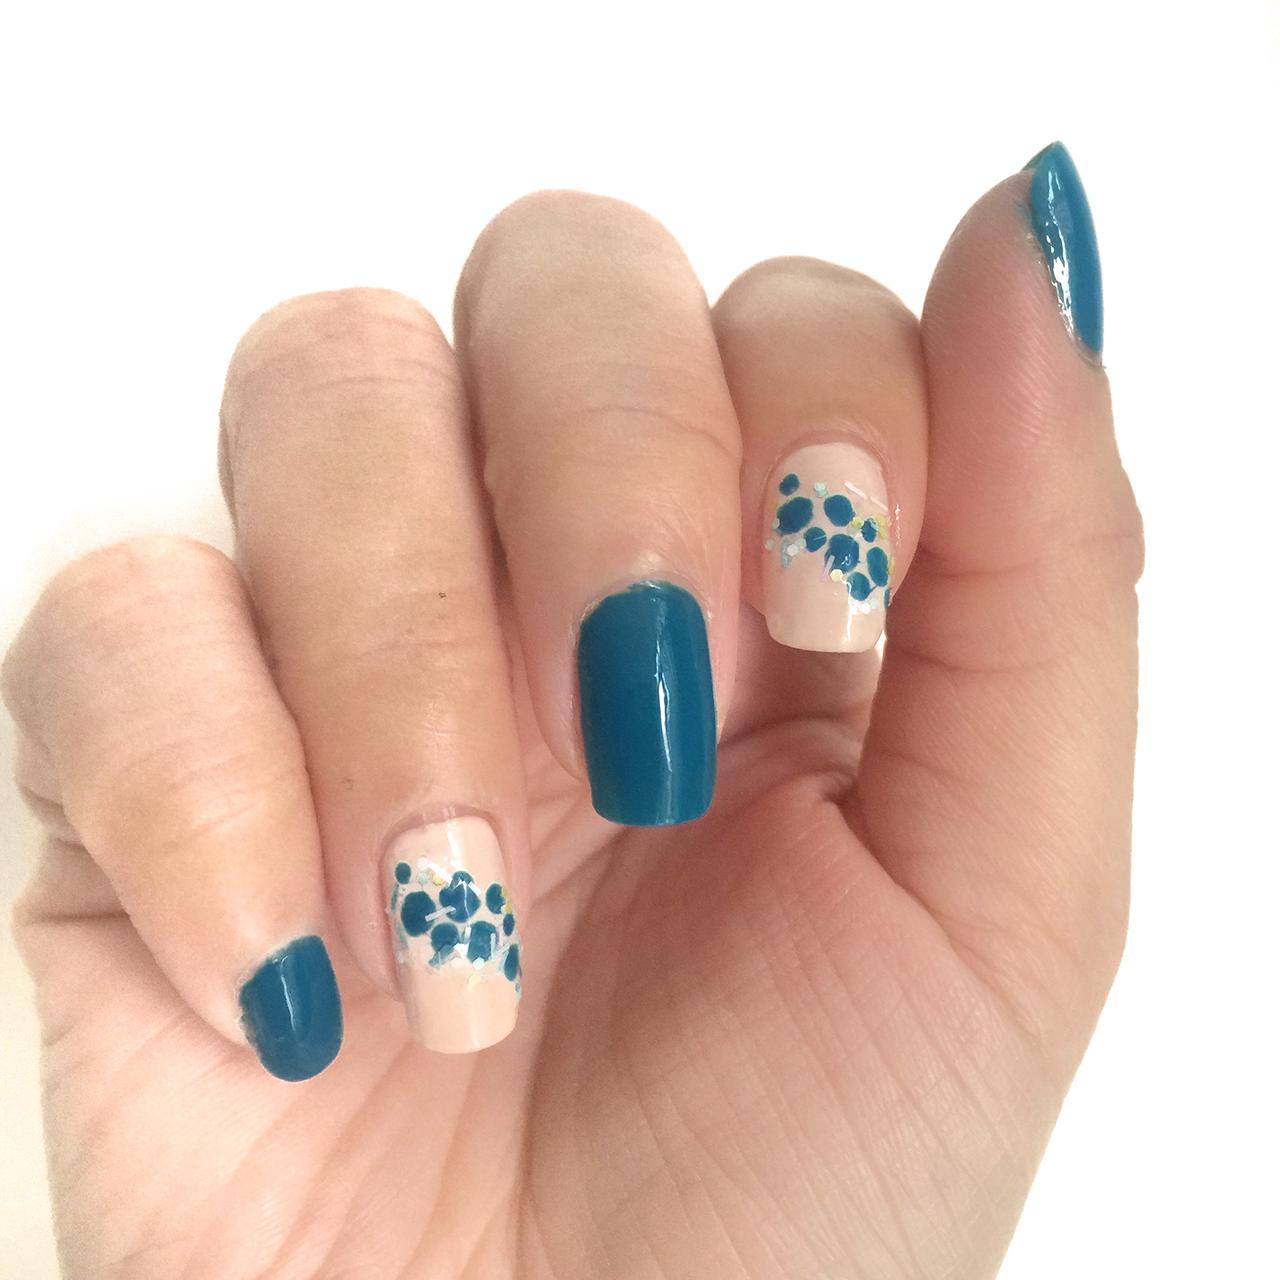 Dior Polka Dots notd 2